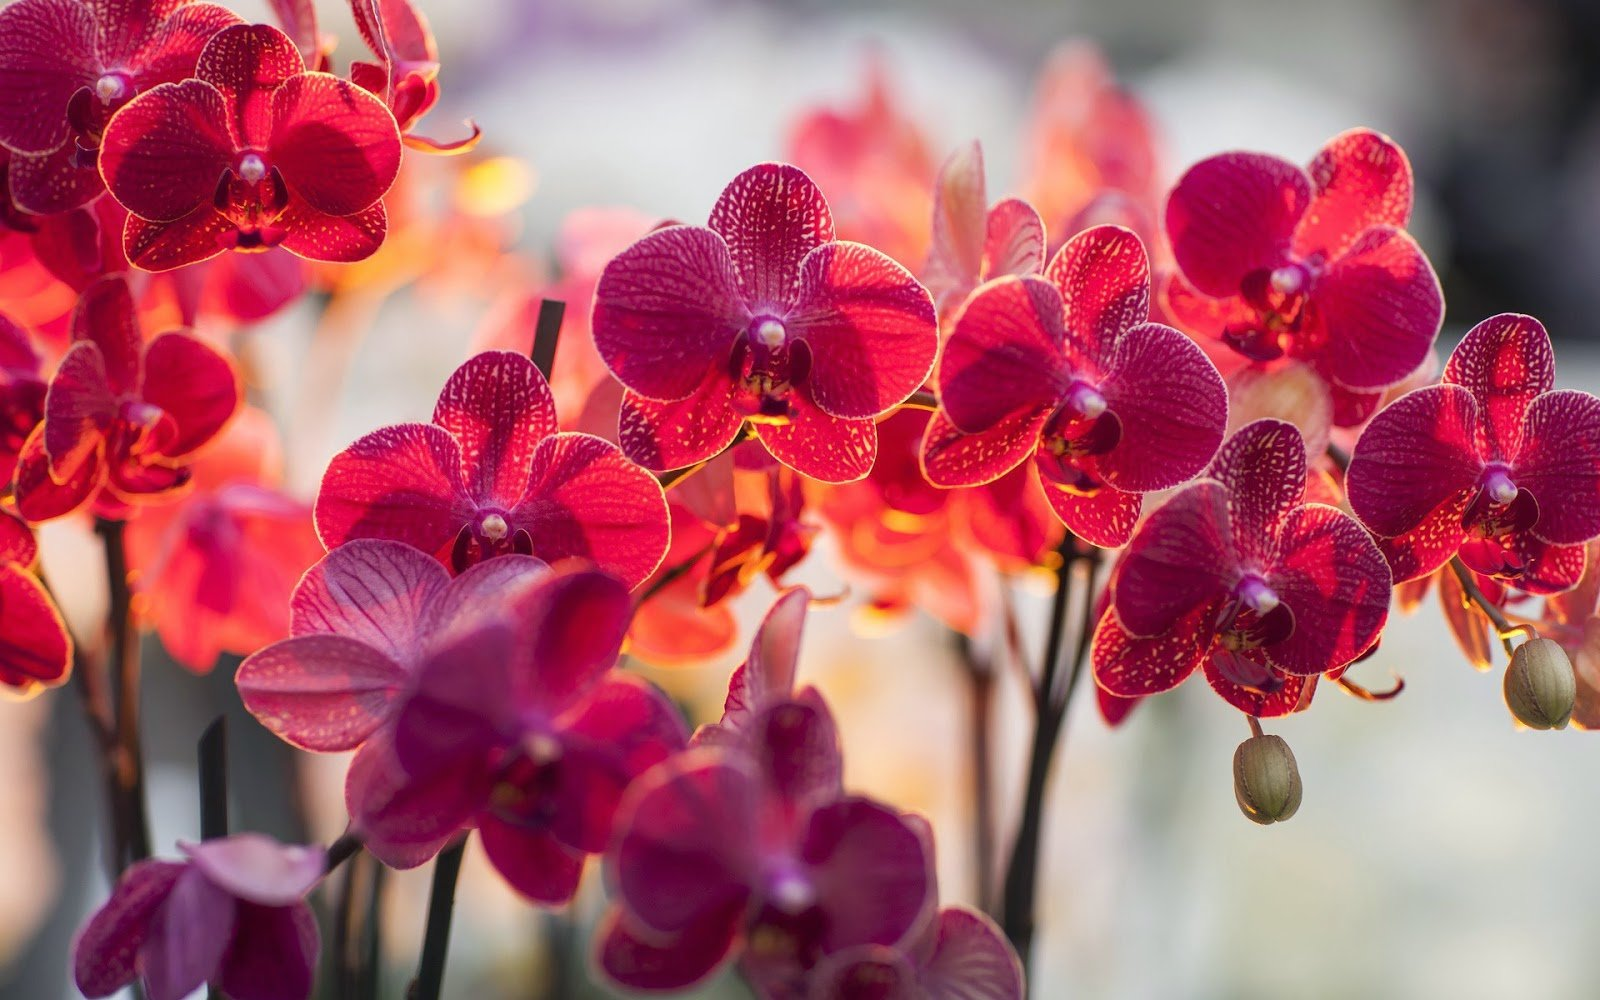 Precious Orchid Wallpaper 077